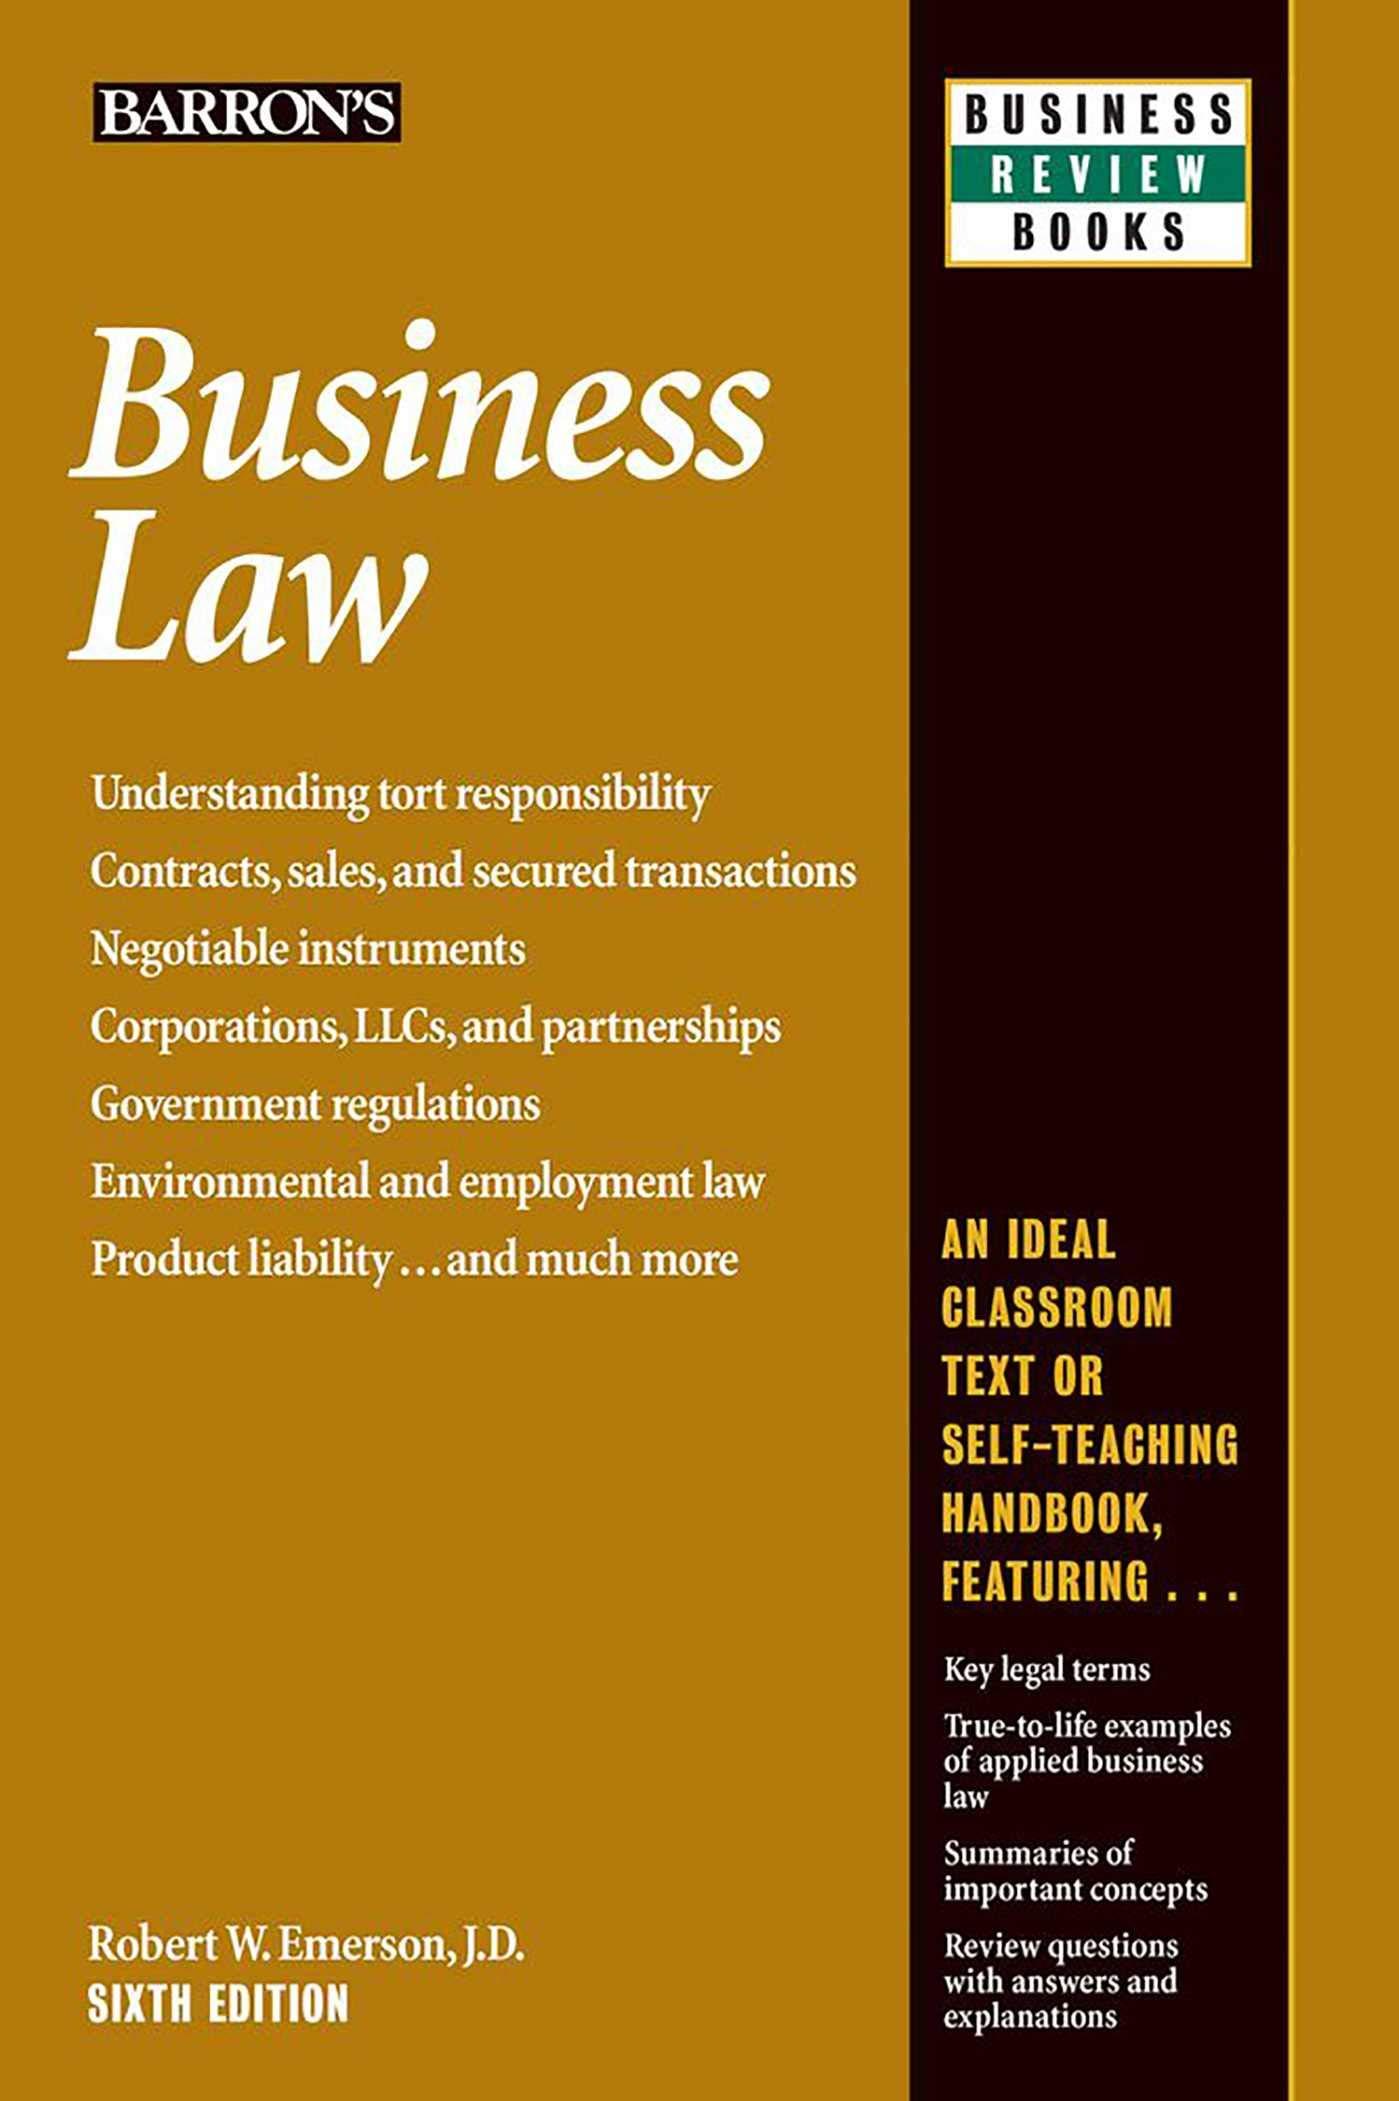 Business Law (Barron's Business Review): Robert W. Emerson J.D. ...